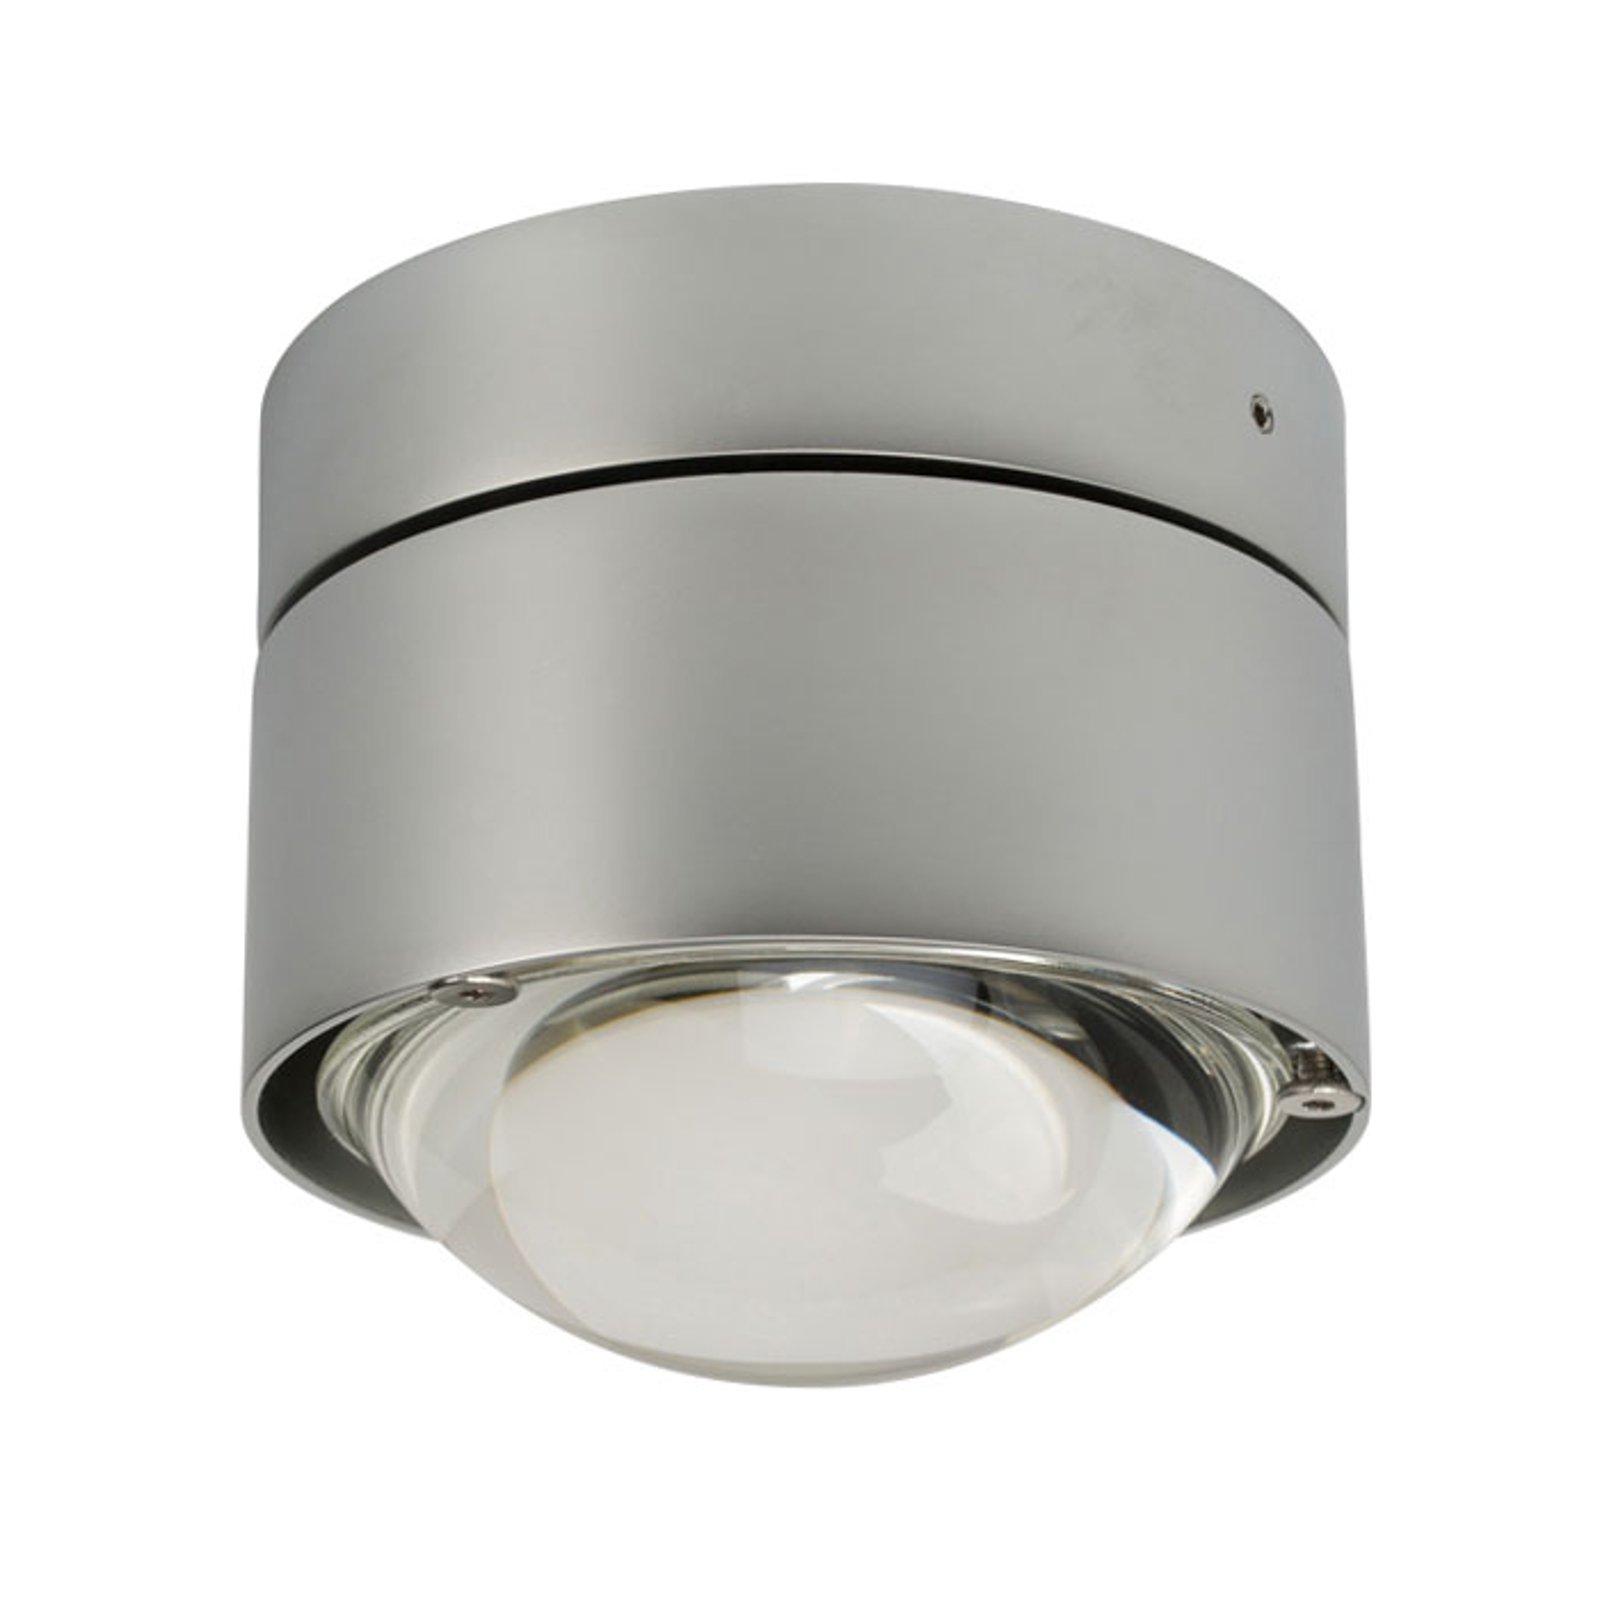 LED-taklampe Puk Plus, krom matt